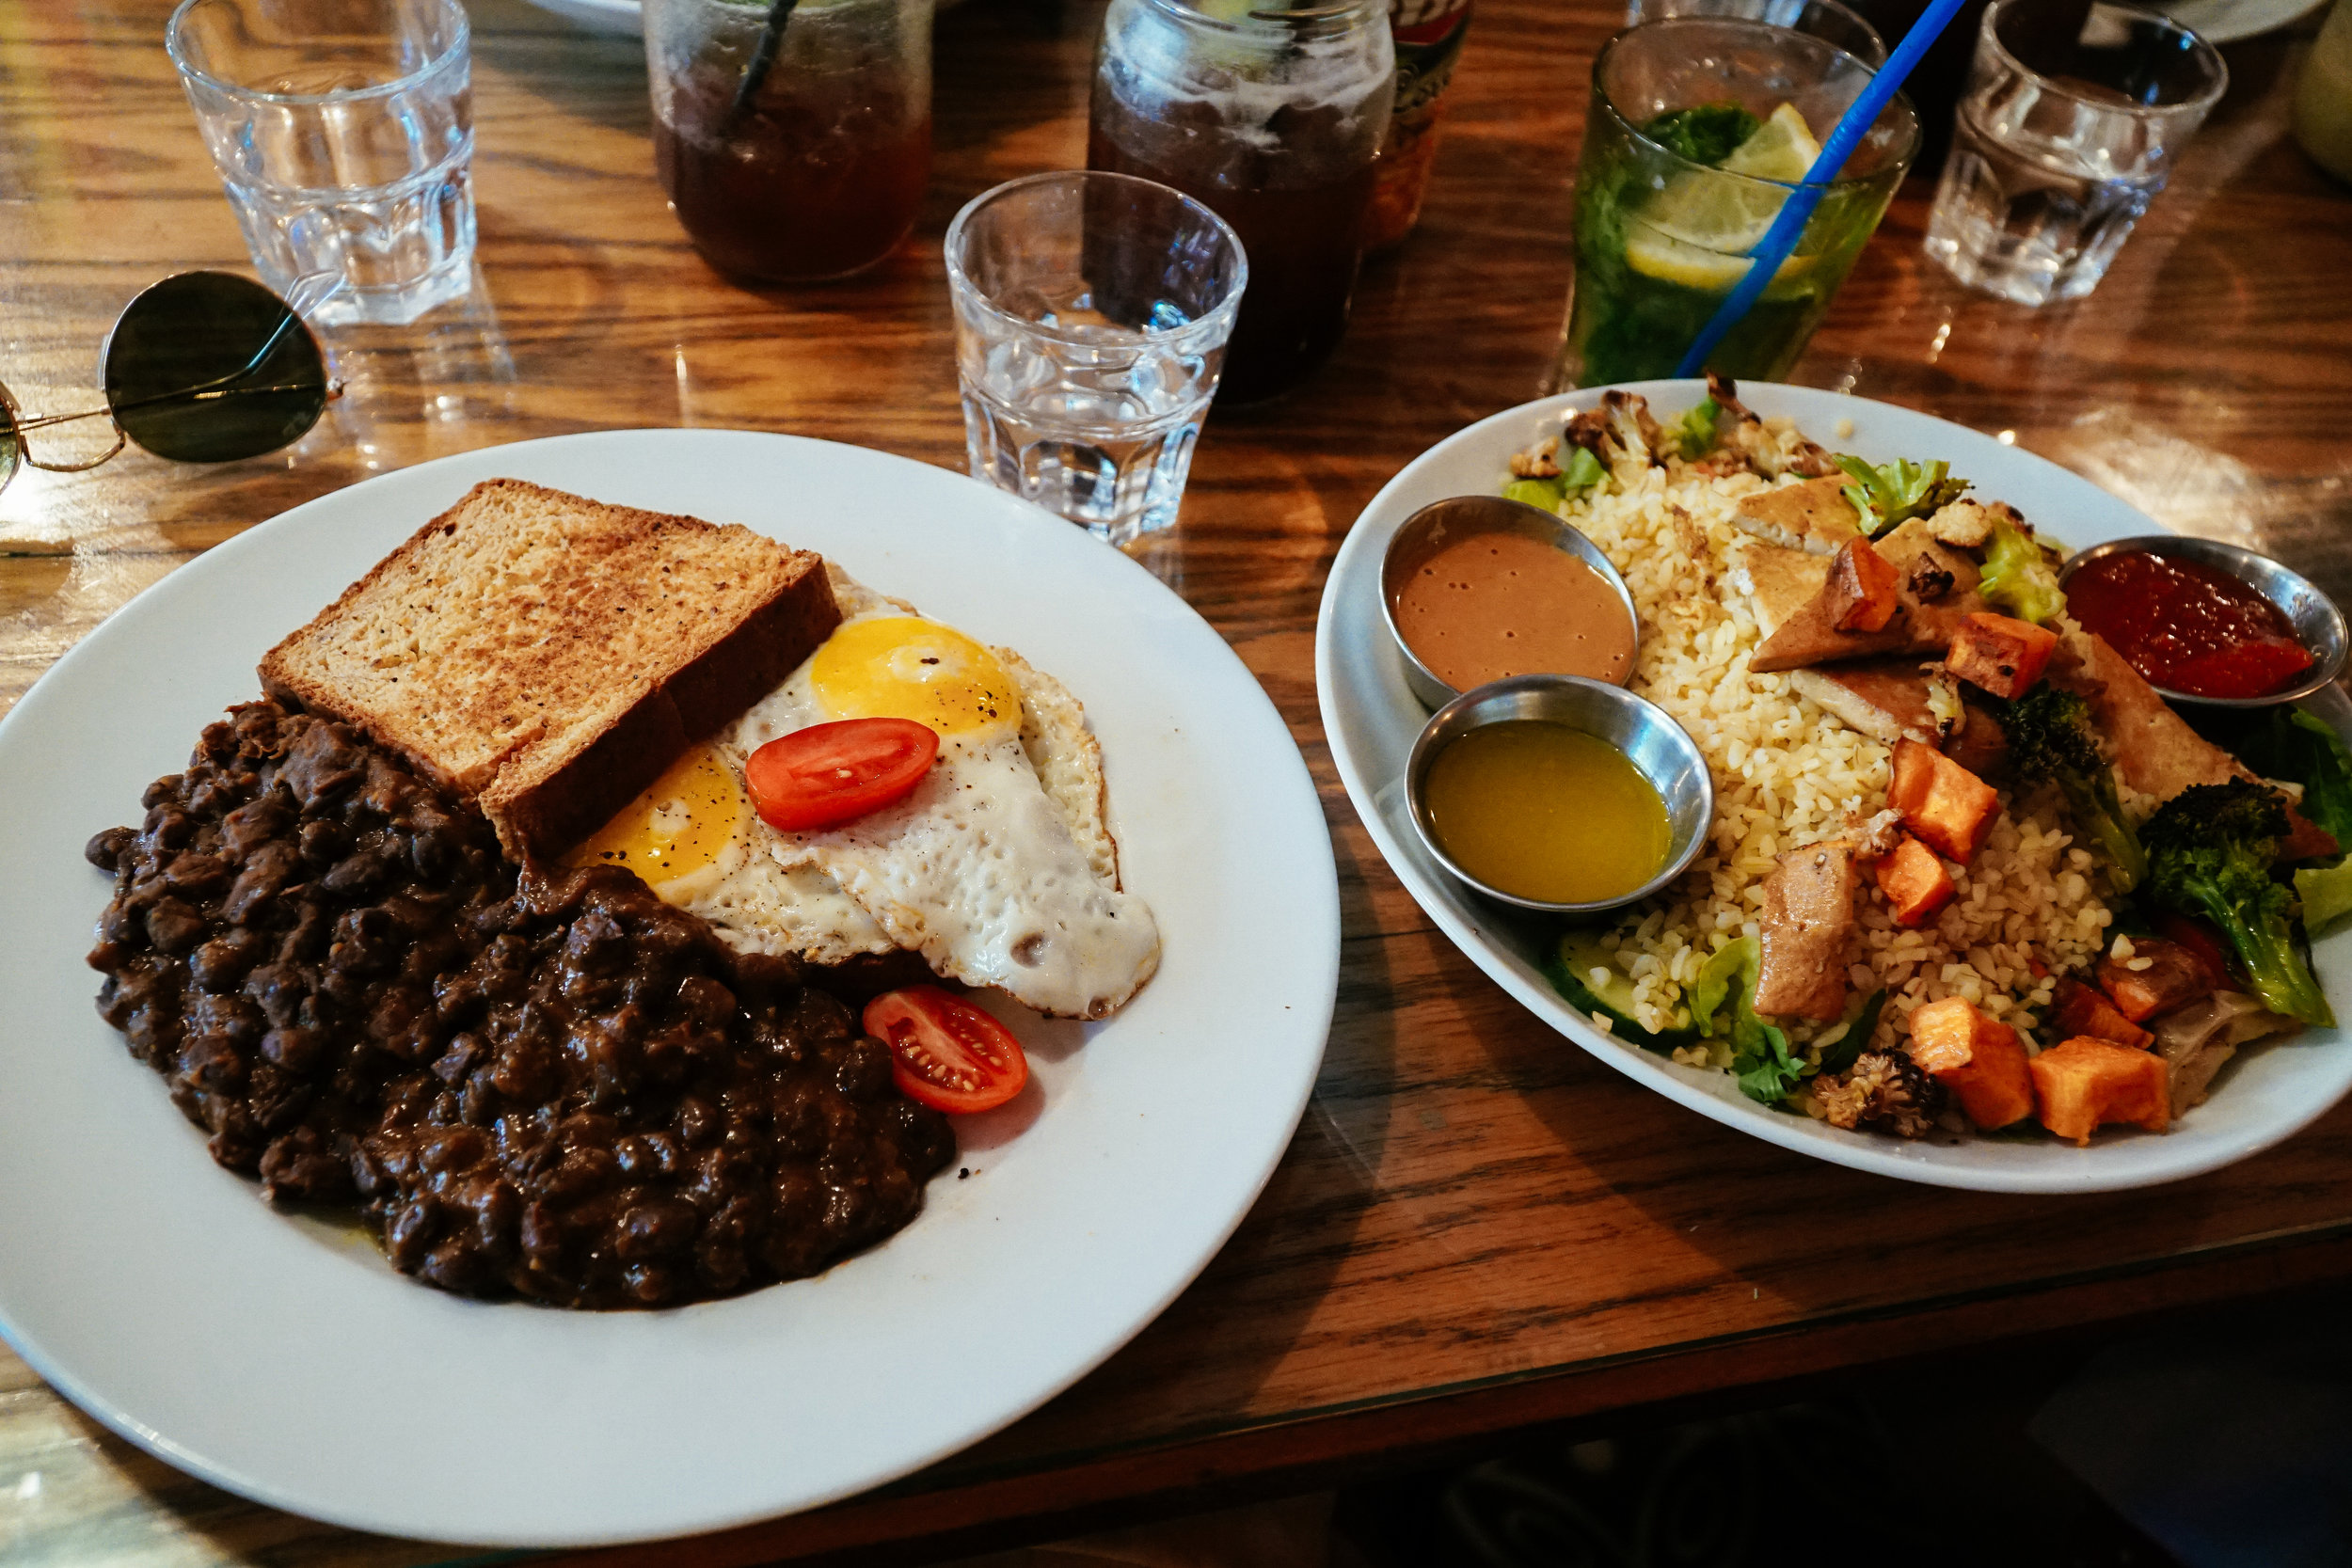 Brunch at Cafe Xoho in Tel Aviv, Israel Julia Friedman Israel Diary #2